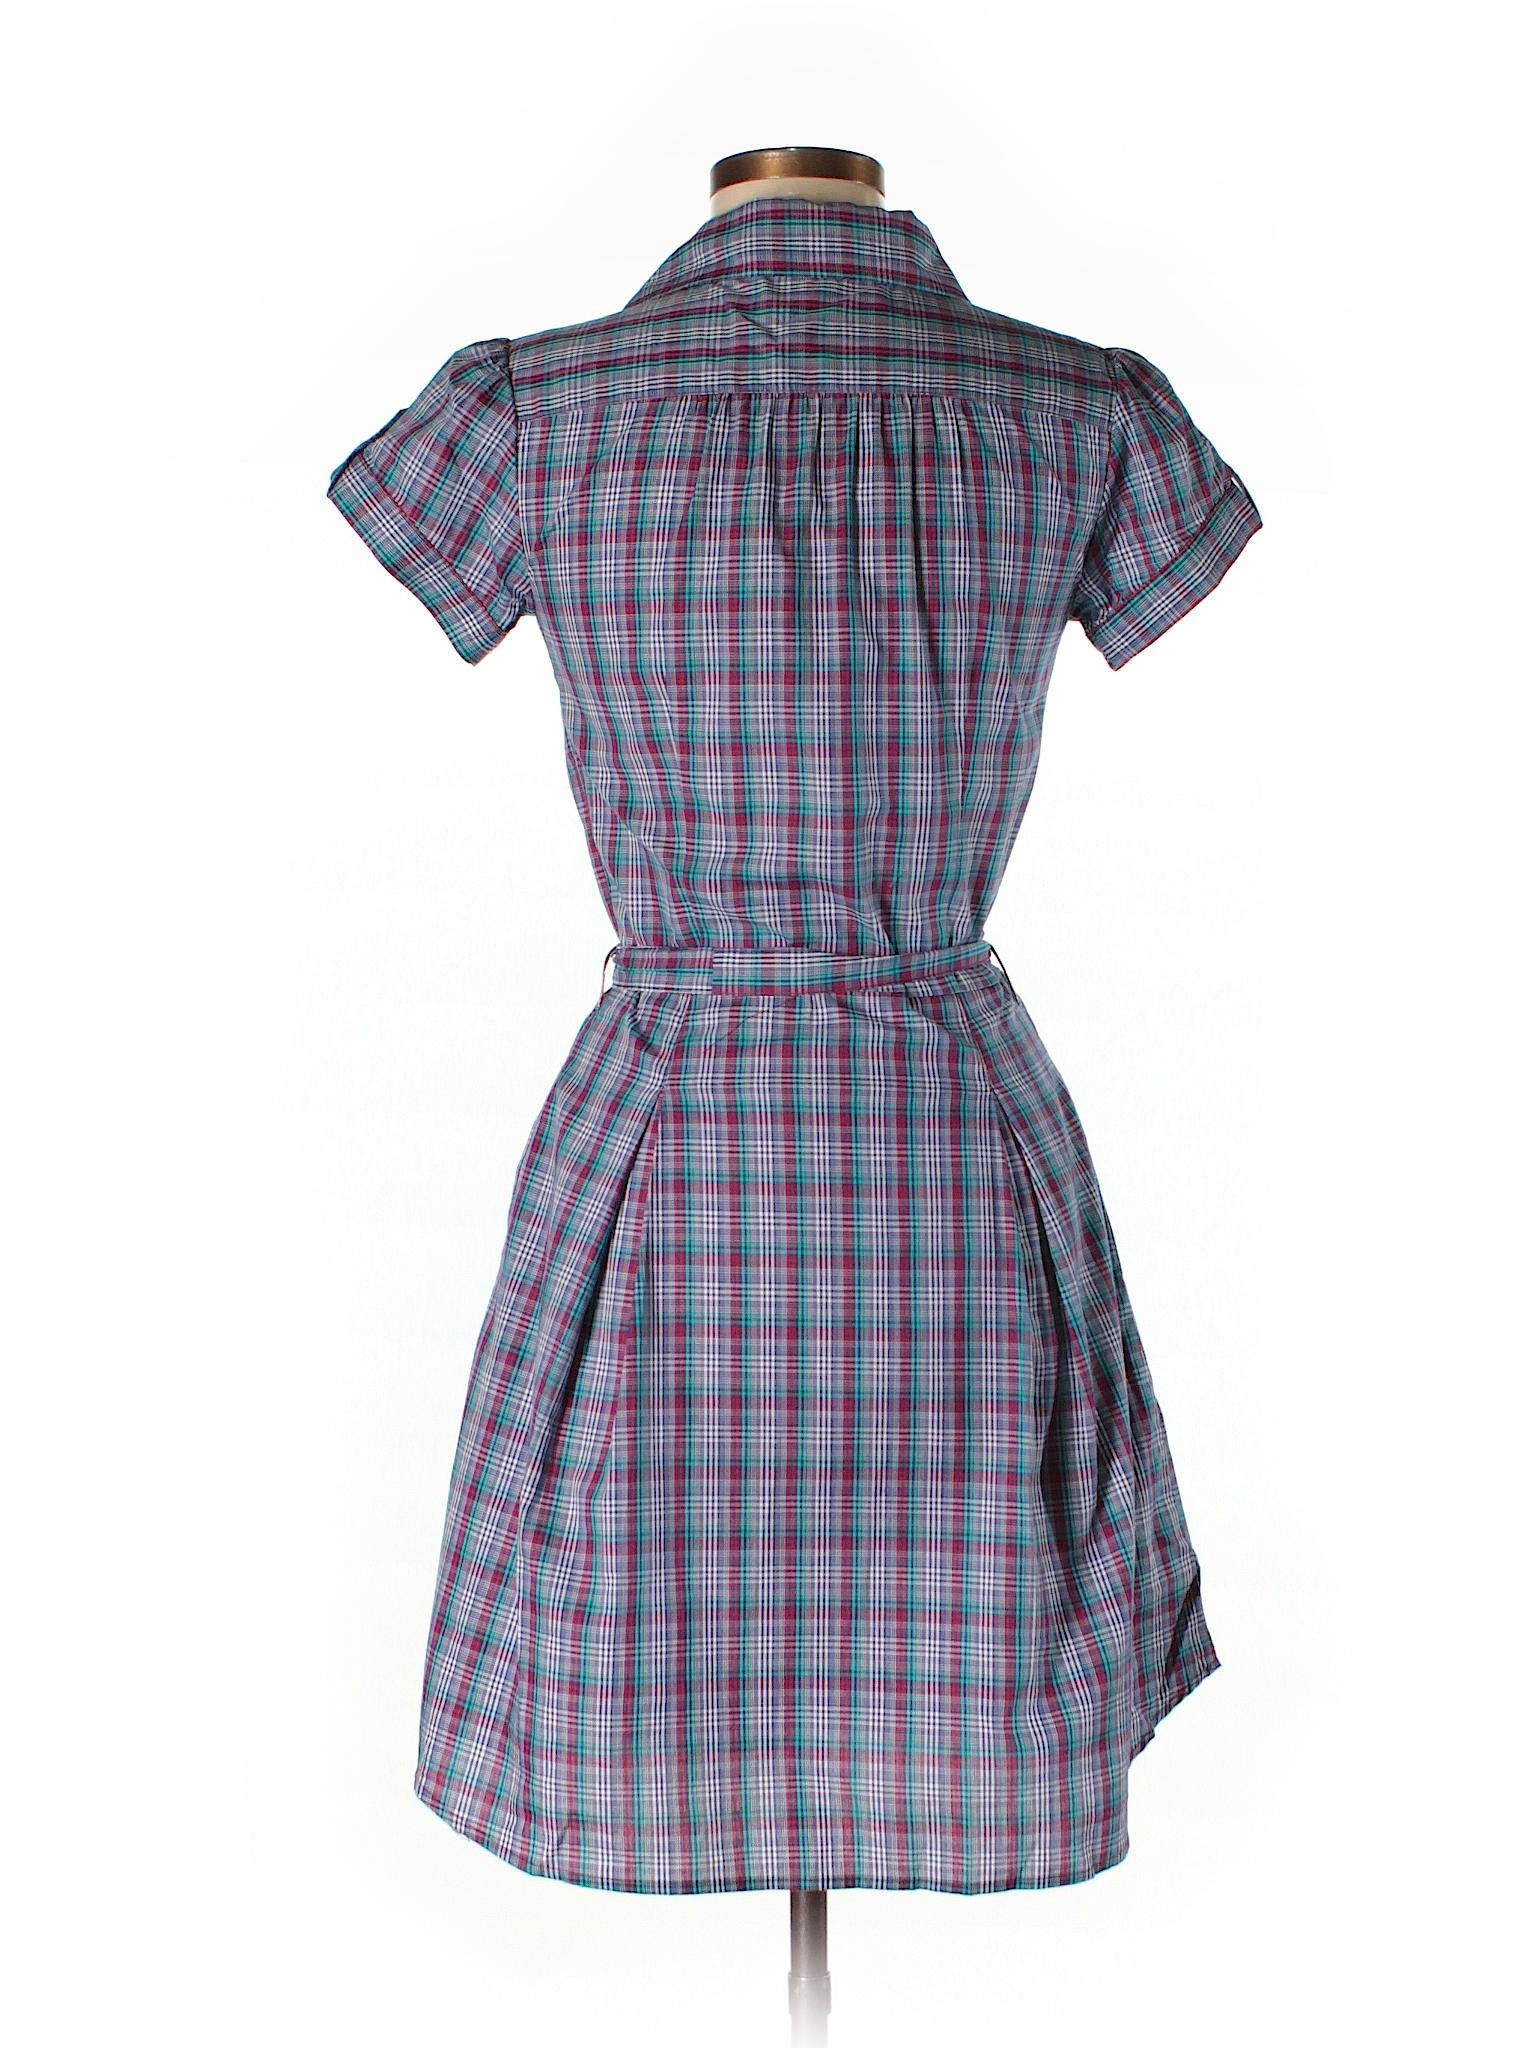 Dress Boutique Casual winter winter Boutique Sunner vwv4xaHqP